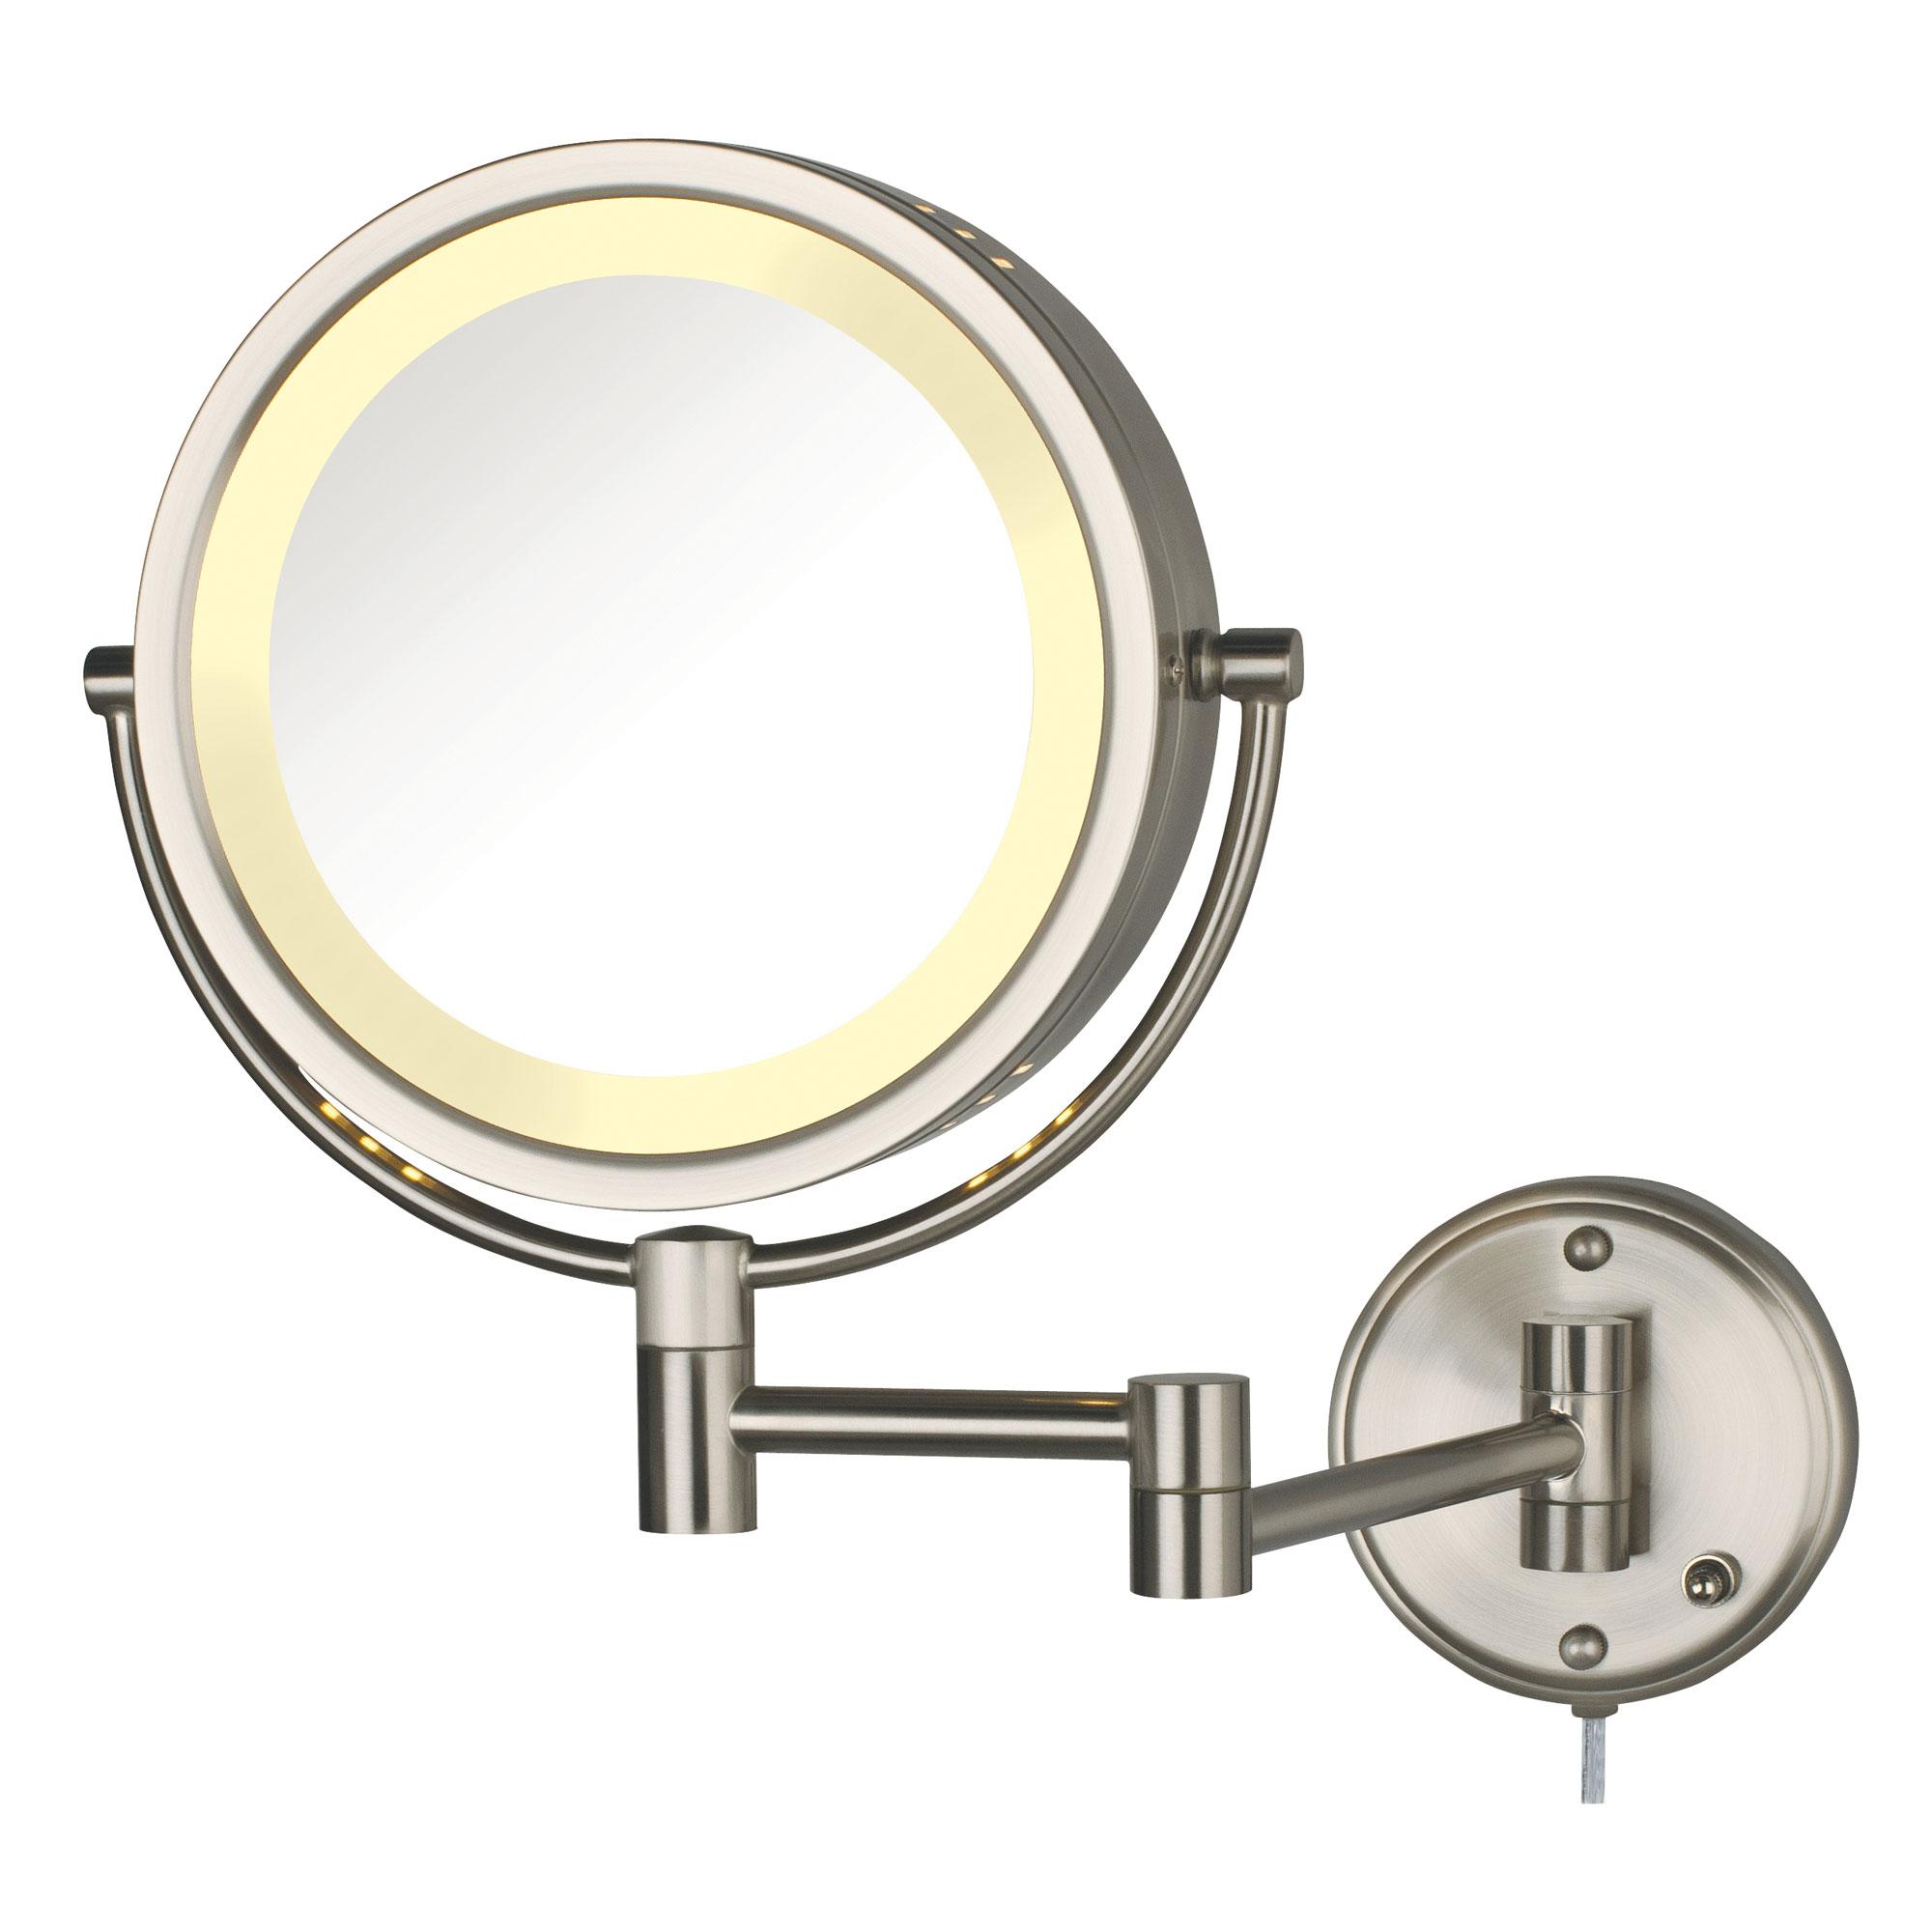 jerdon hl75n 8 5 lighted wall mount mirror 1x 8x. Black Bedroom Furniture Sets. Home Design Ideas